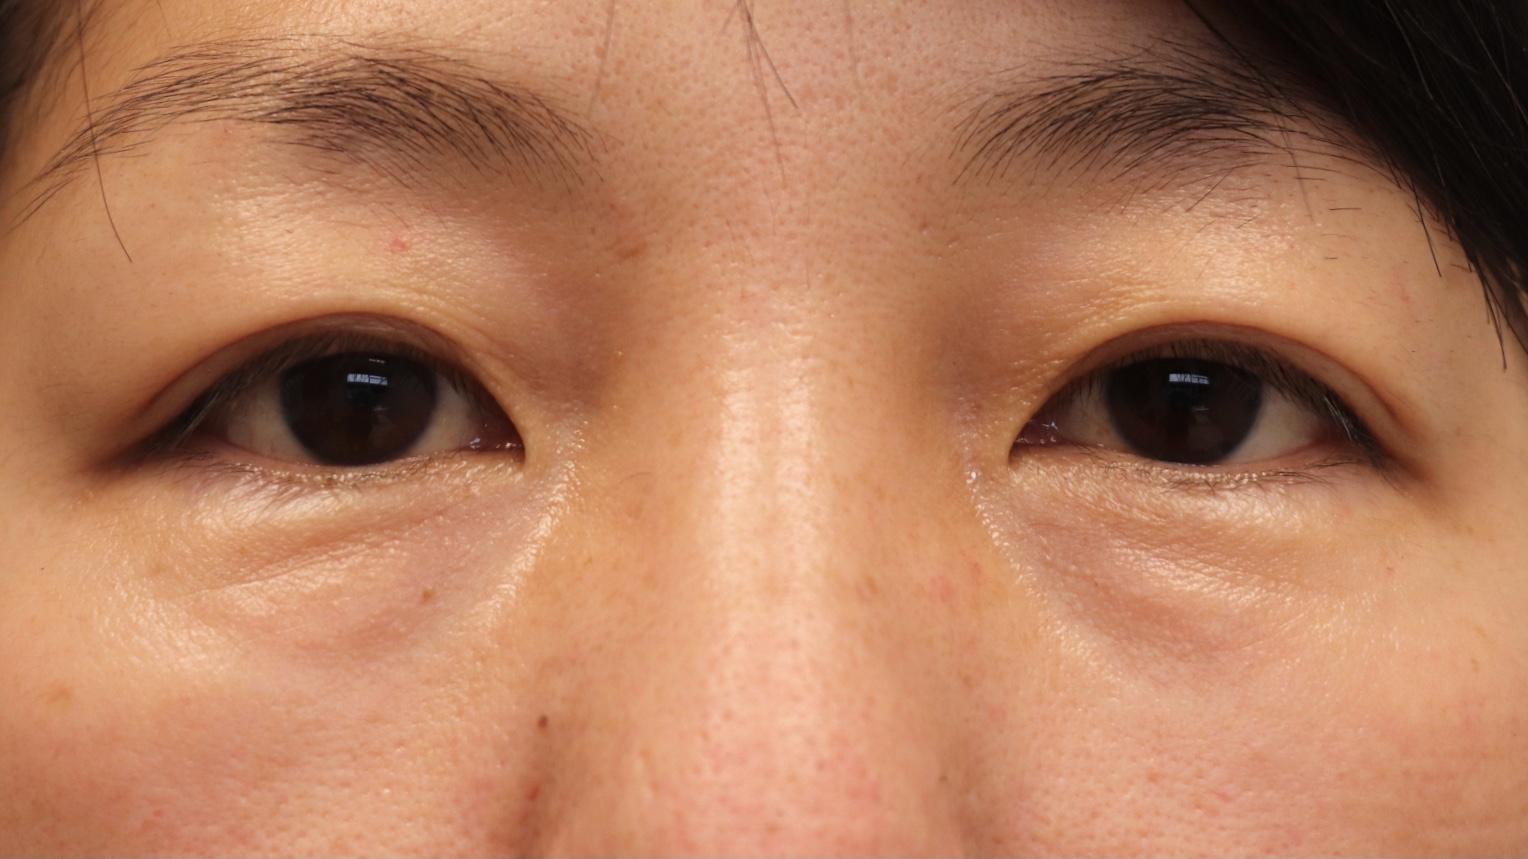 Lower Blepharoplasty before photo